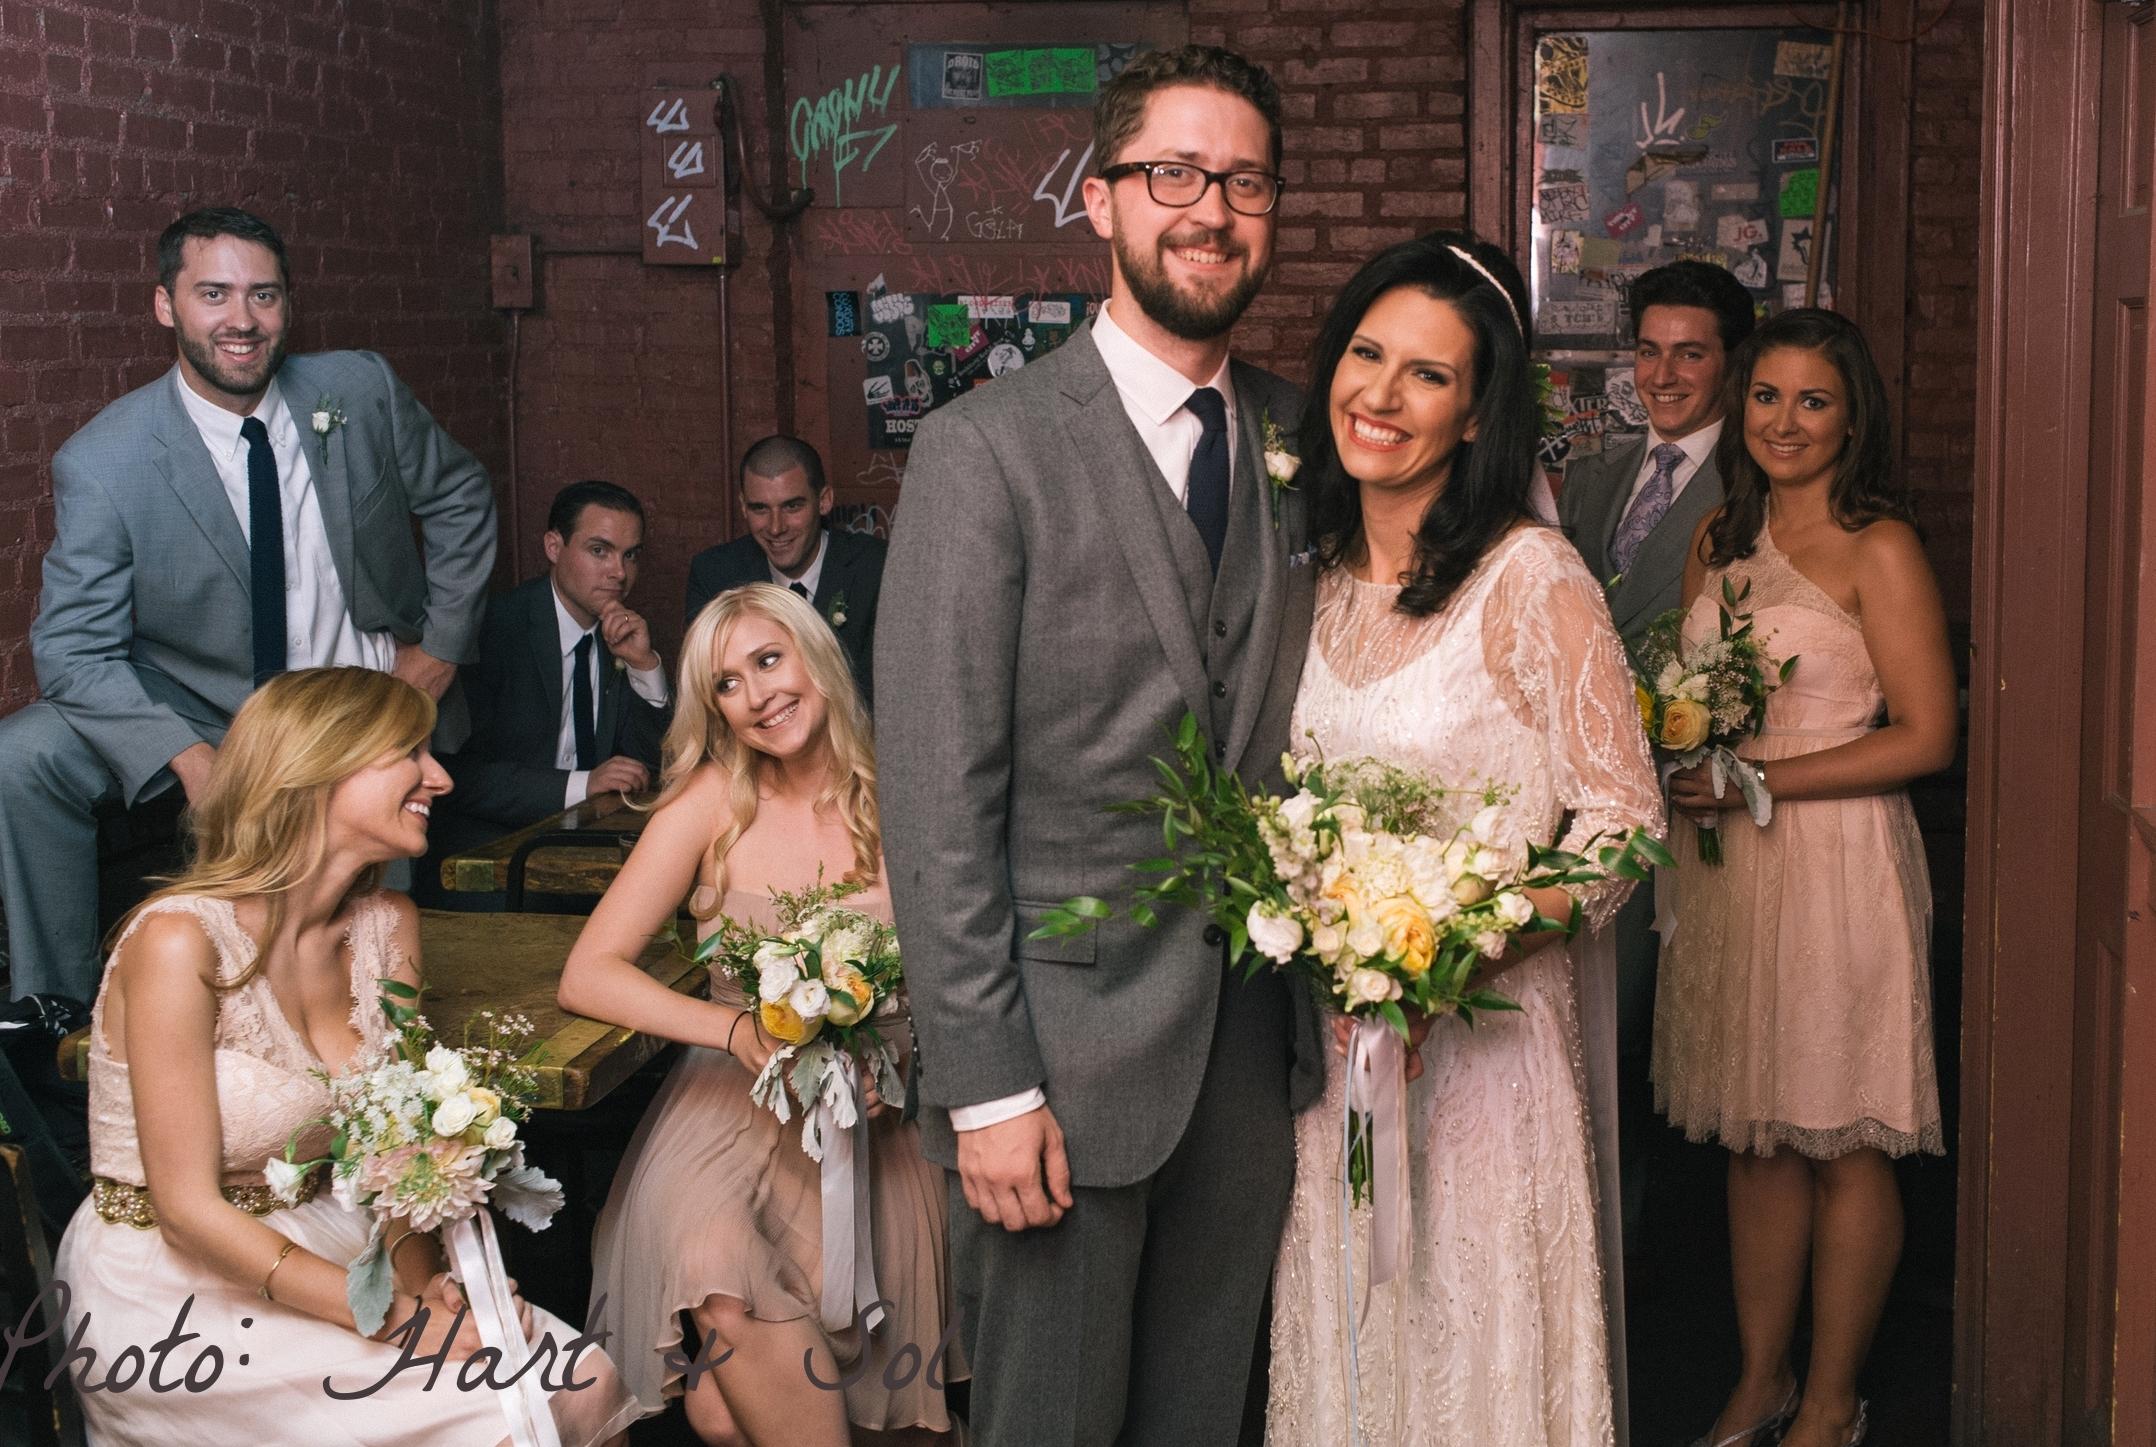 kat wedding.jpg